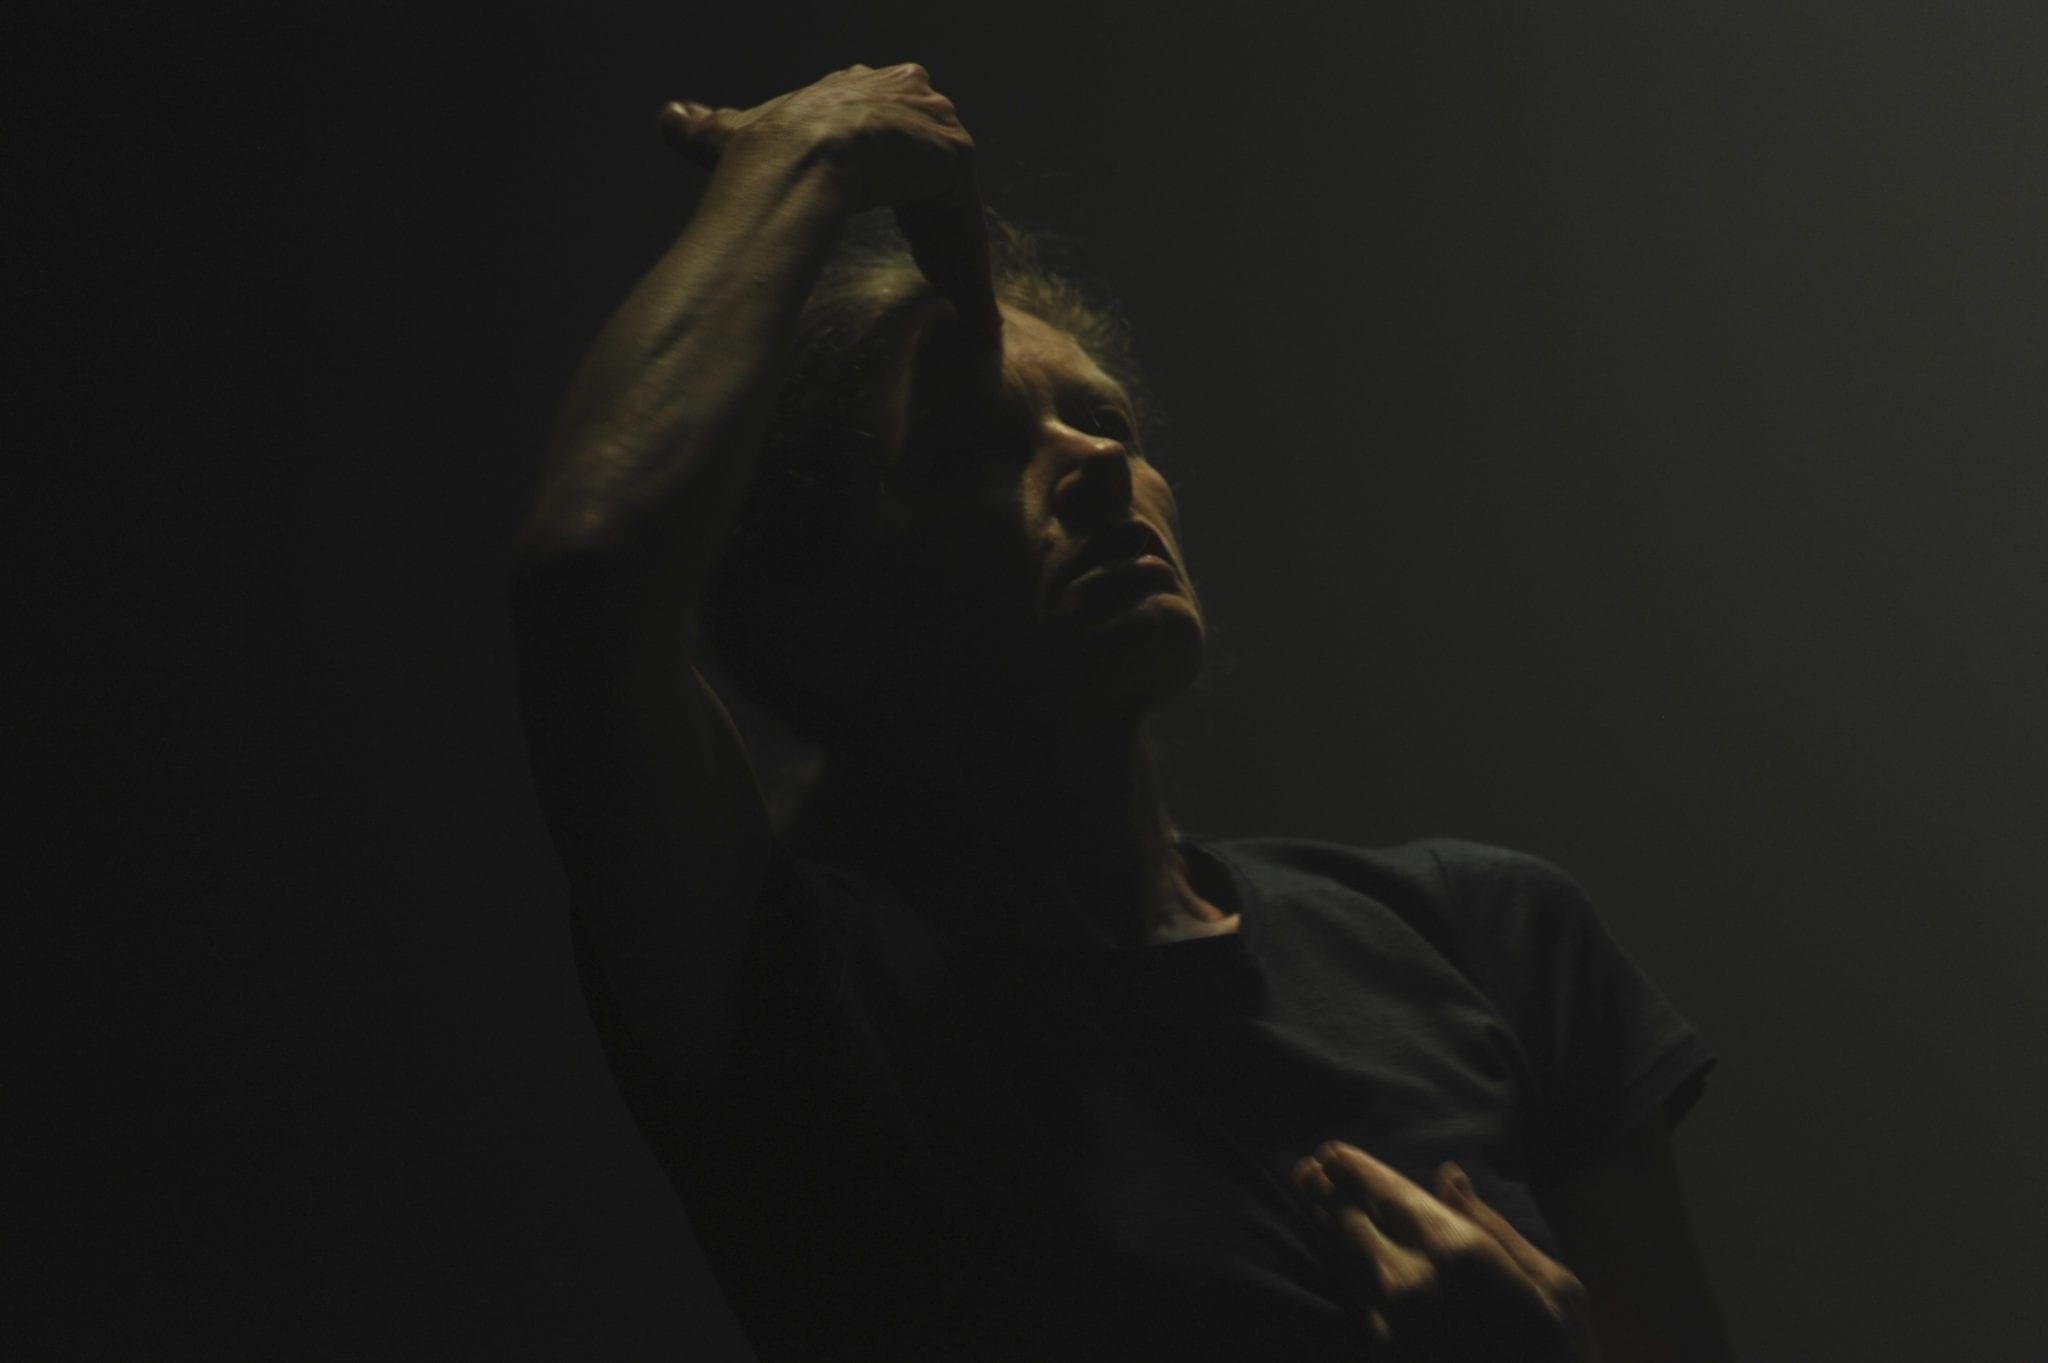 The Boom Project, Rosalind Crisp / Omeo Dance as part of Dance Massive 2015. Image credit Heidrun Löhr.